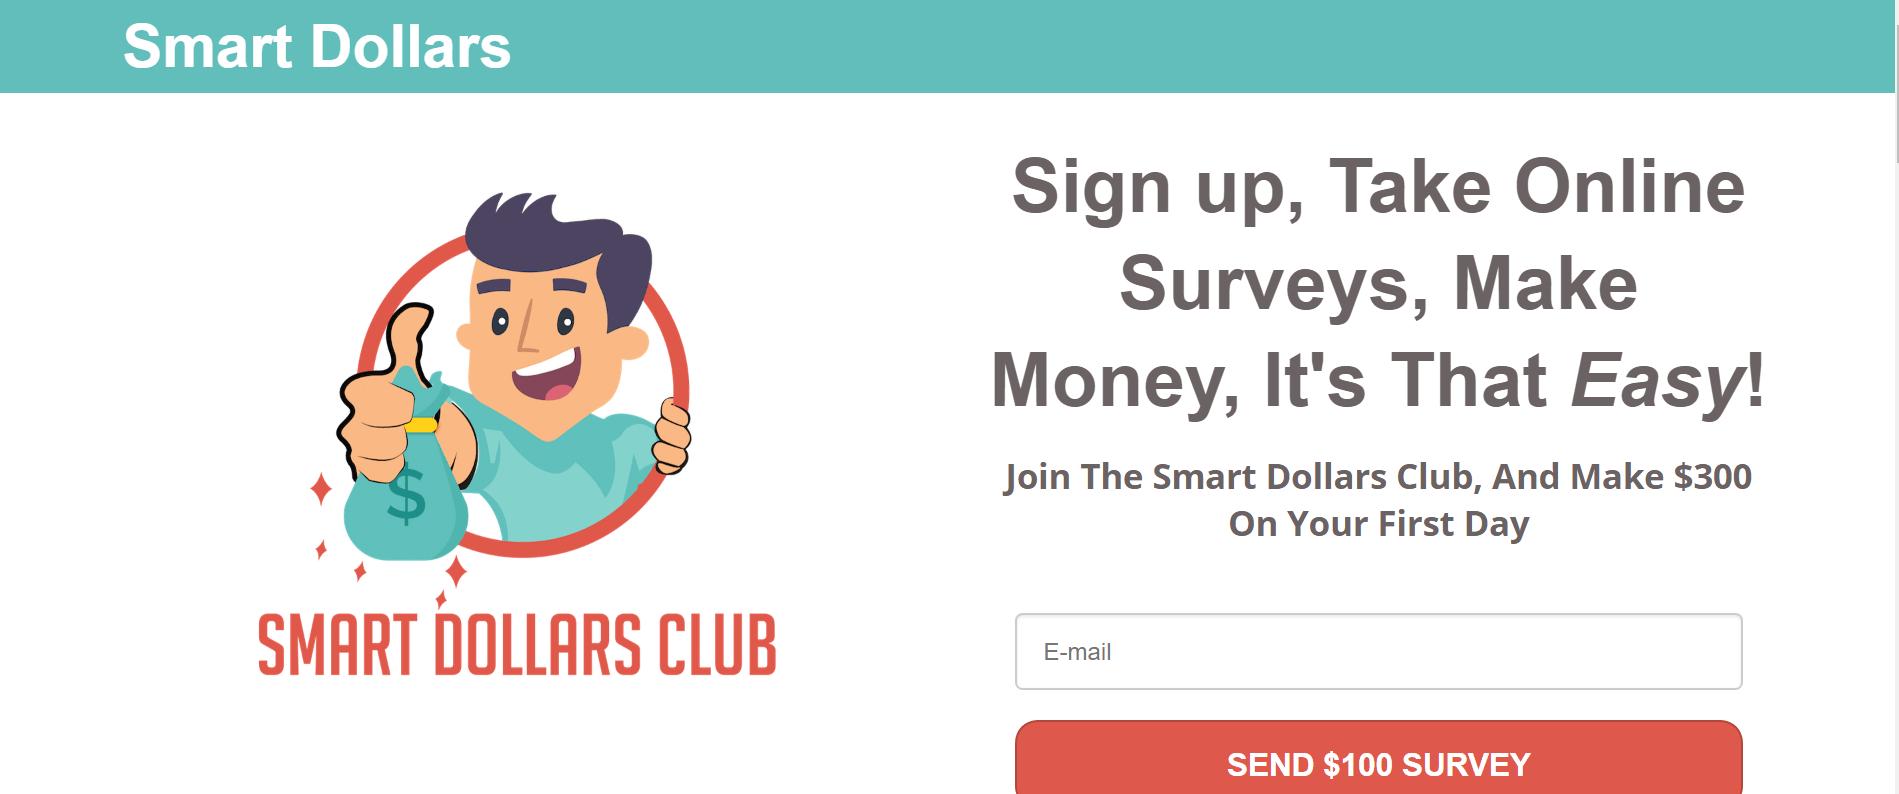 homepage of smart dollar club